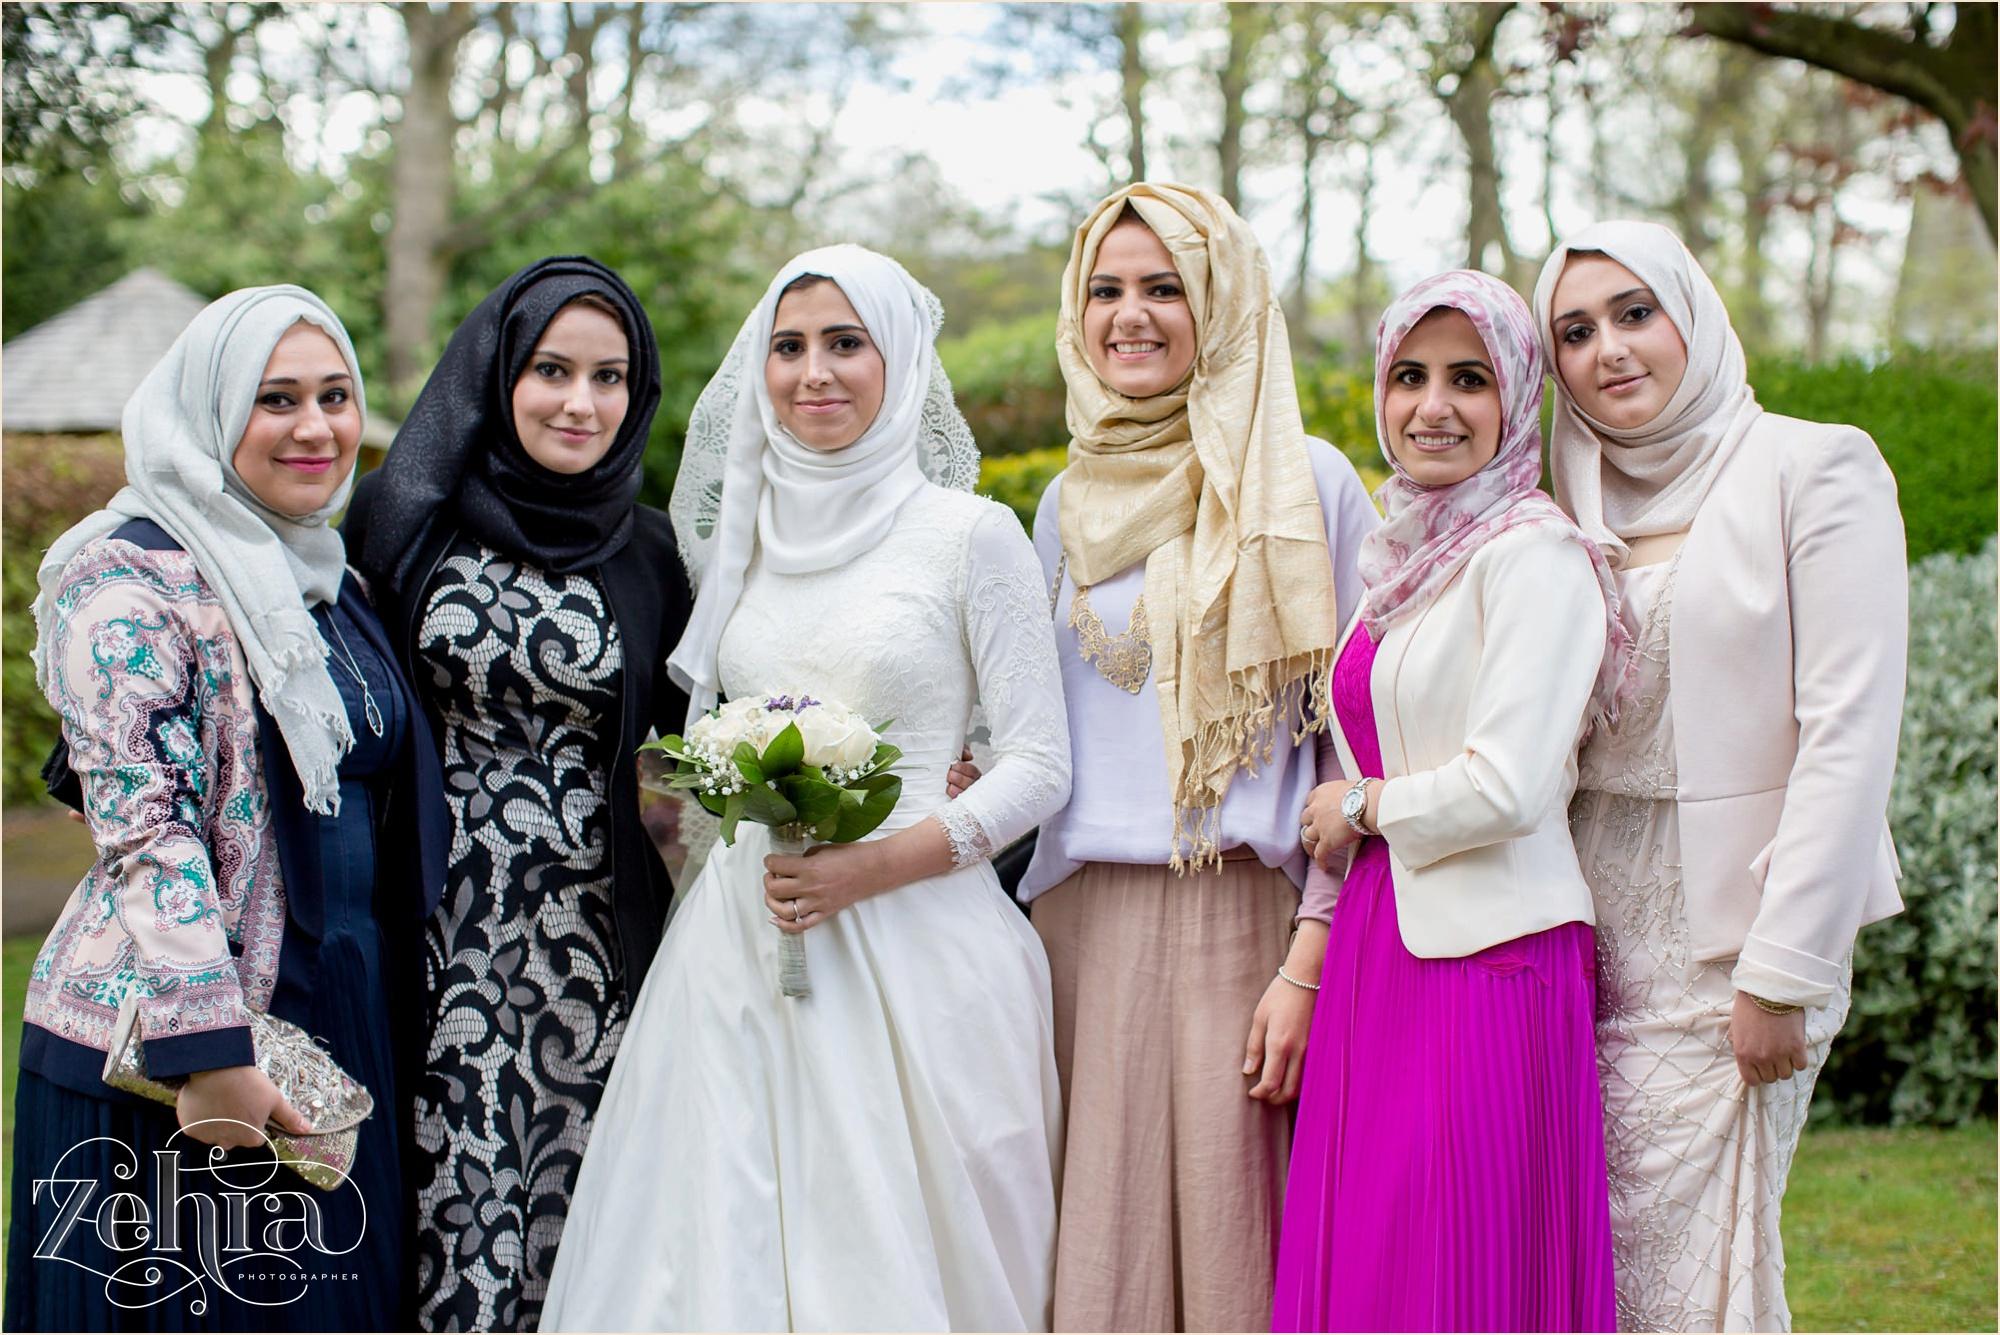 jasira manchester wedding photographer_0082.jpg